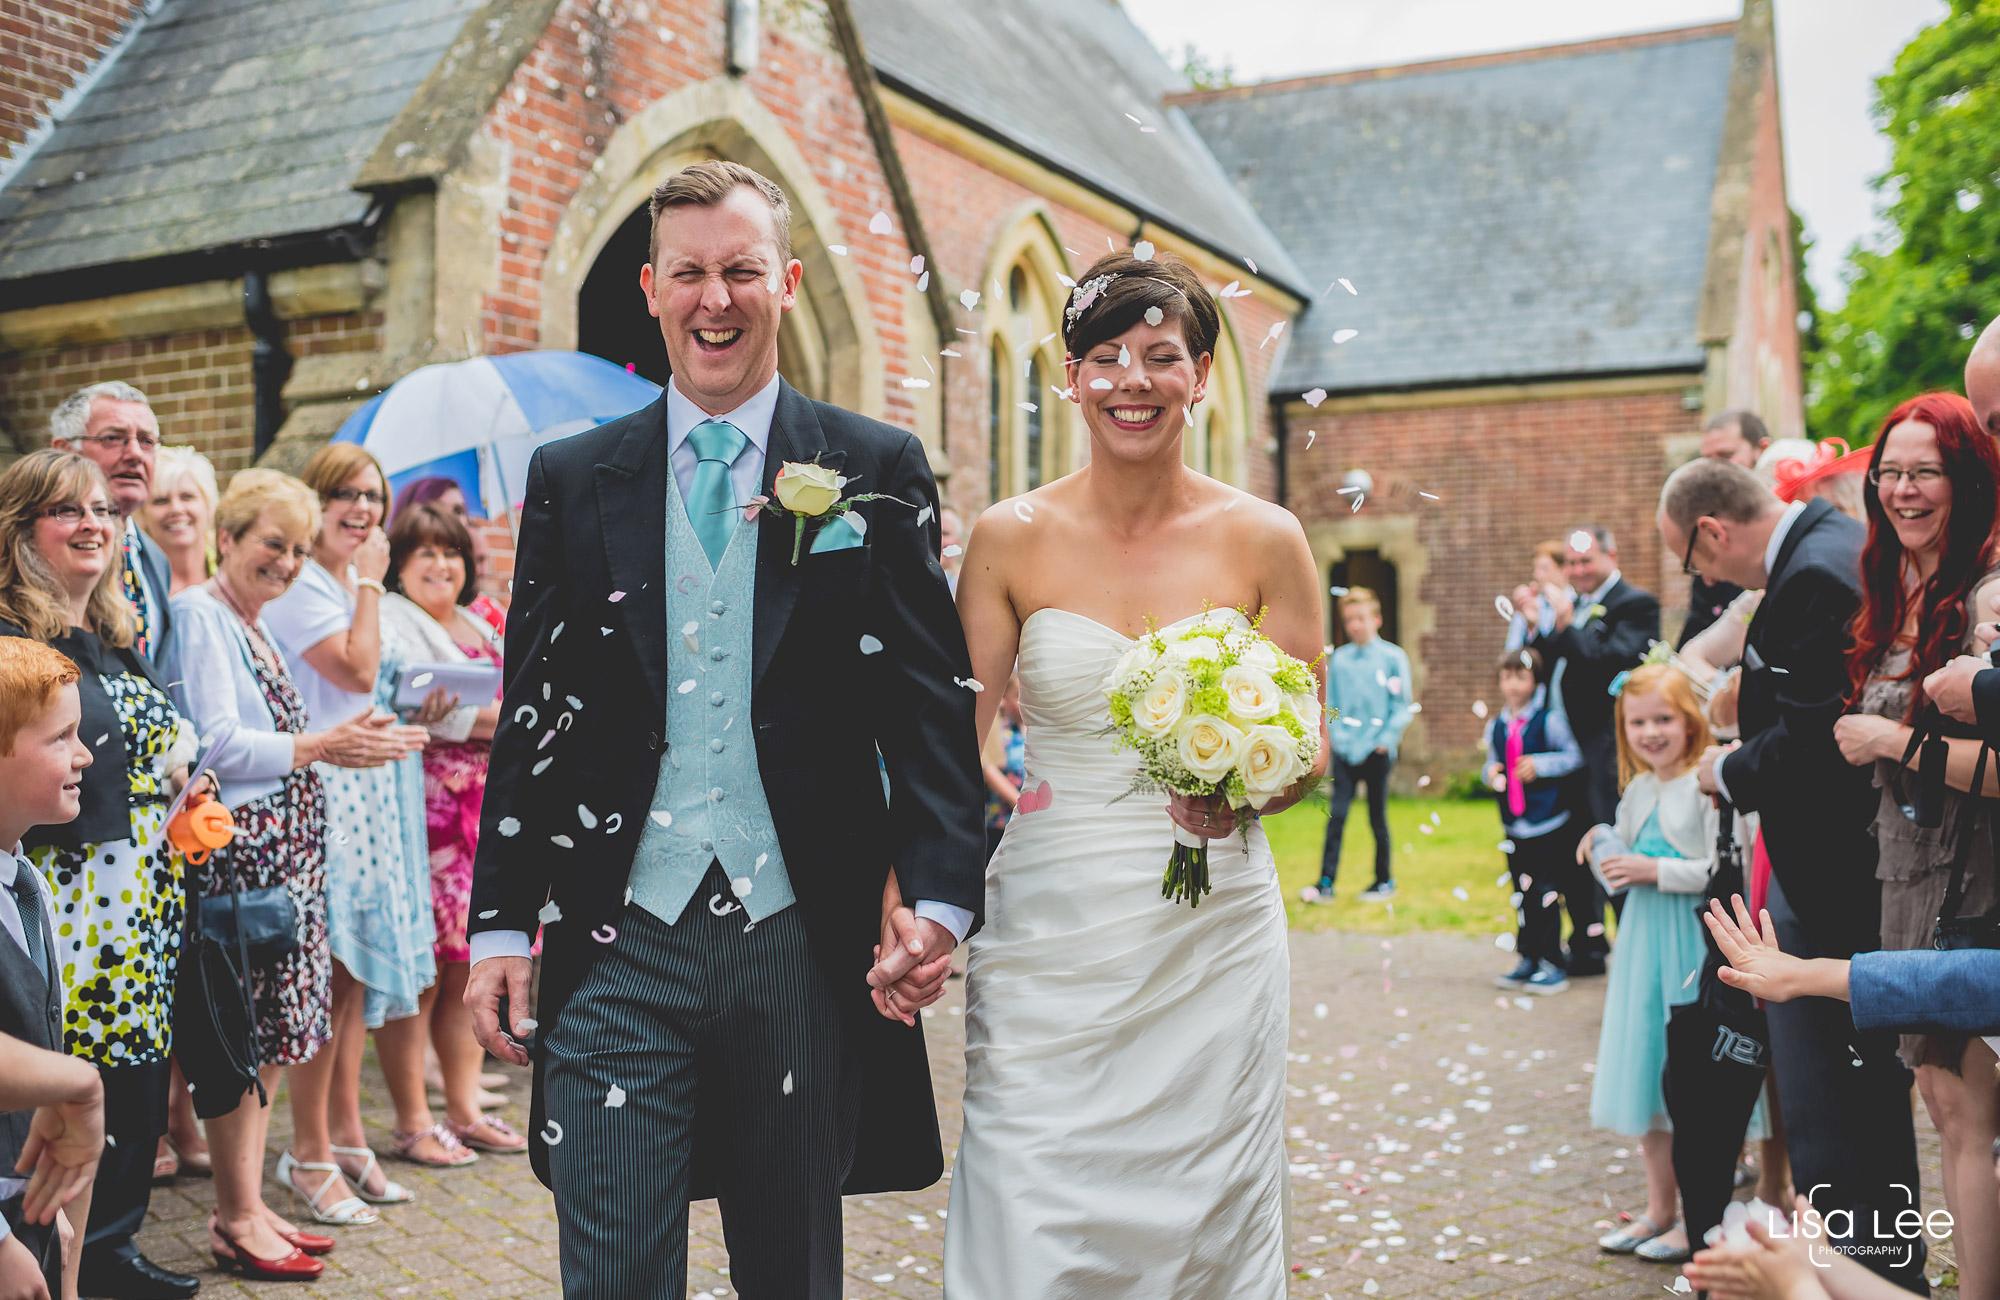 lisa-lee-wedding-photography-burton-2.jpg